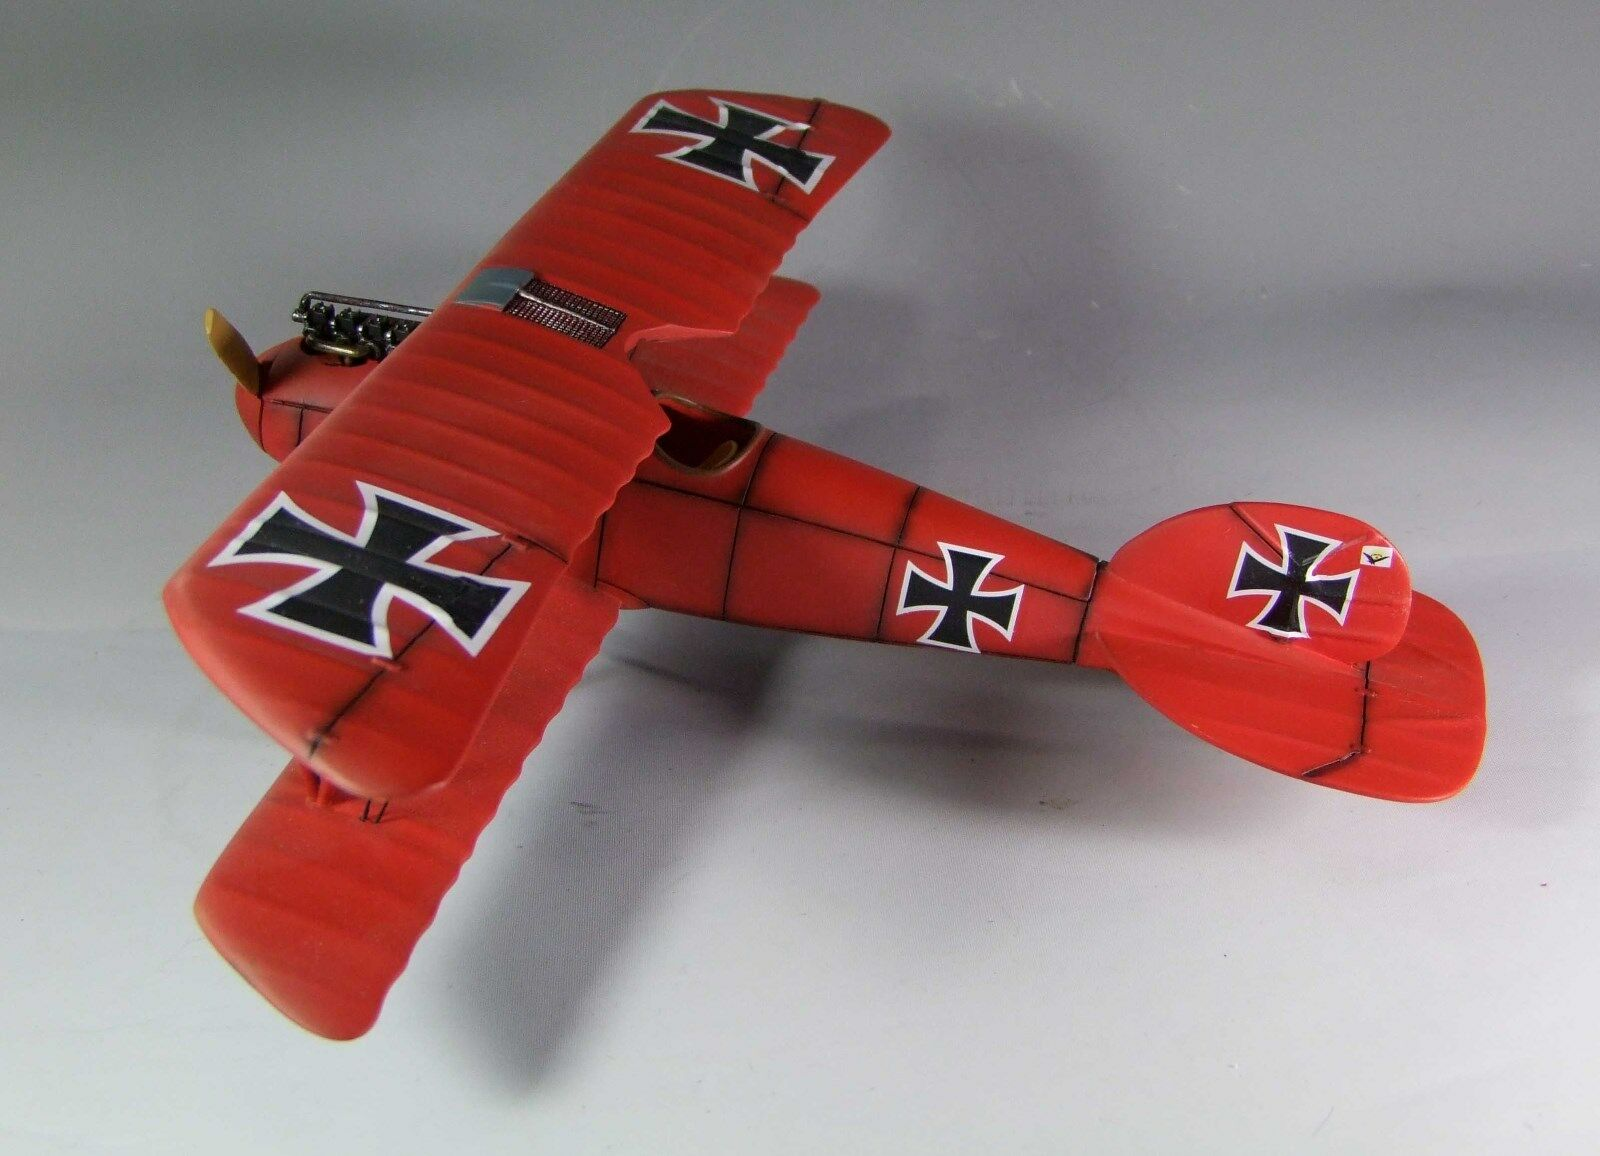 1/30 Guerra Mundial ALBATROS D. III un biplano alemán Jasta 11 WG002